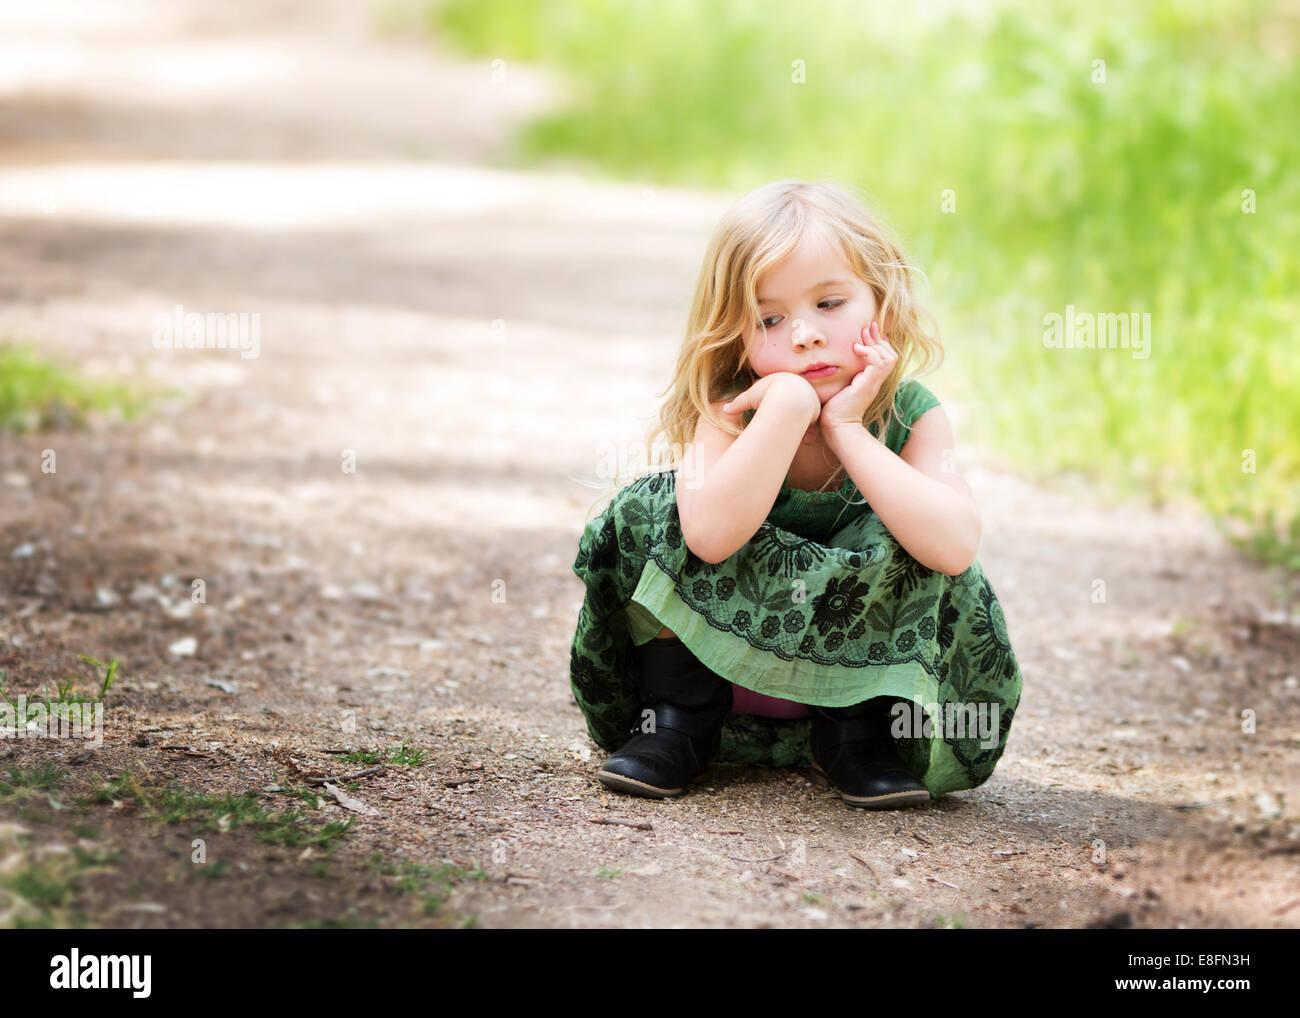 Girl (4-5) crouching on path - Stock Image